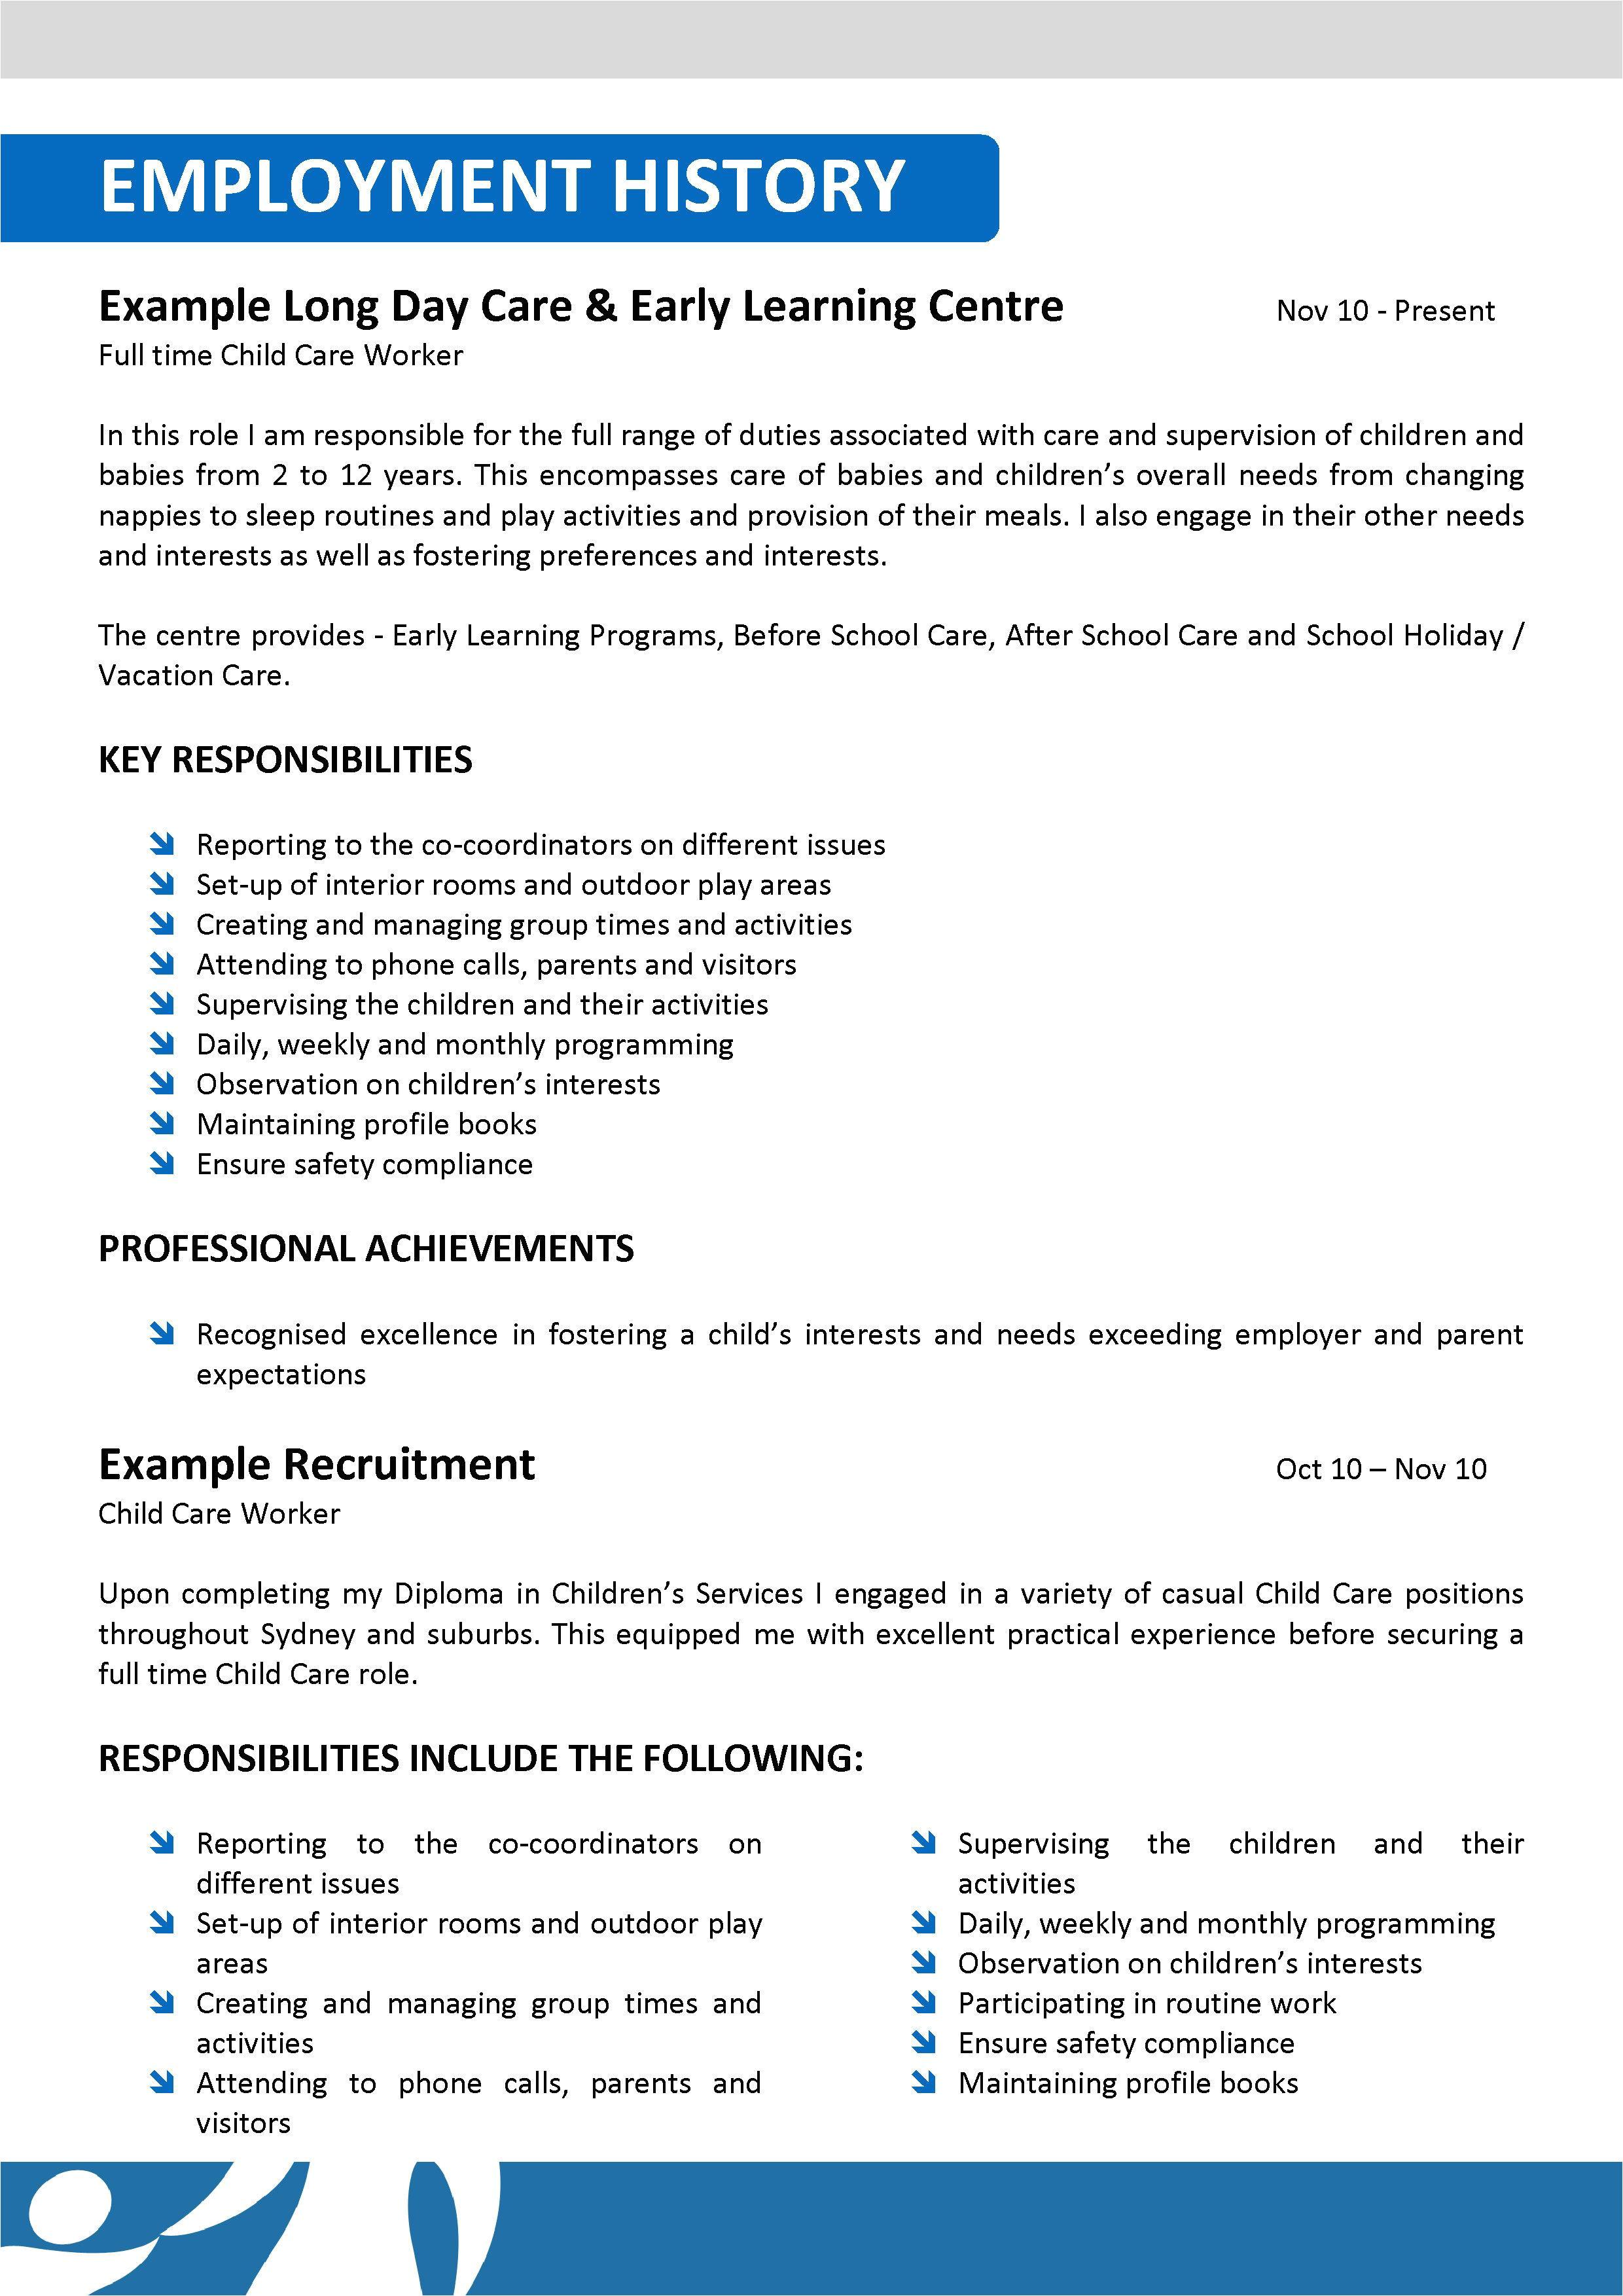 aged care nursing community resume template 005